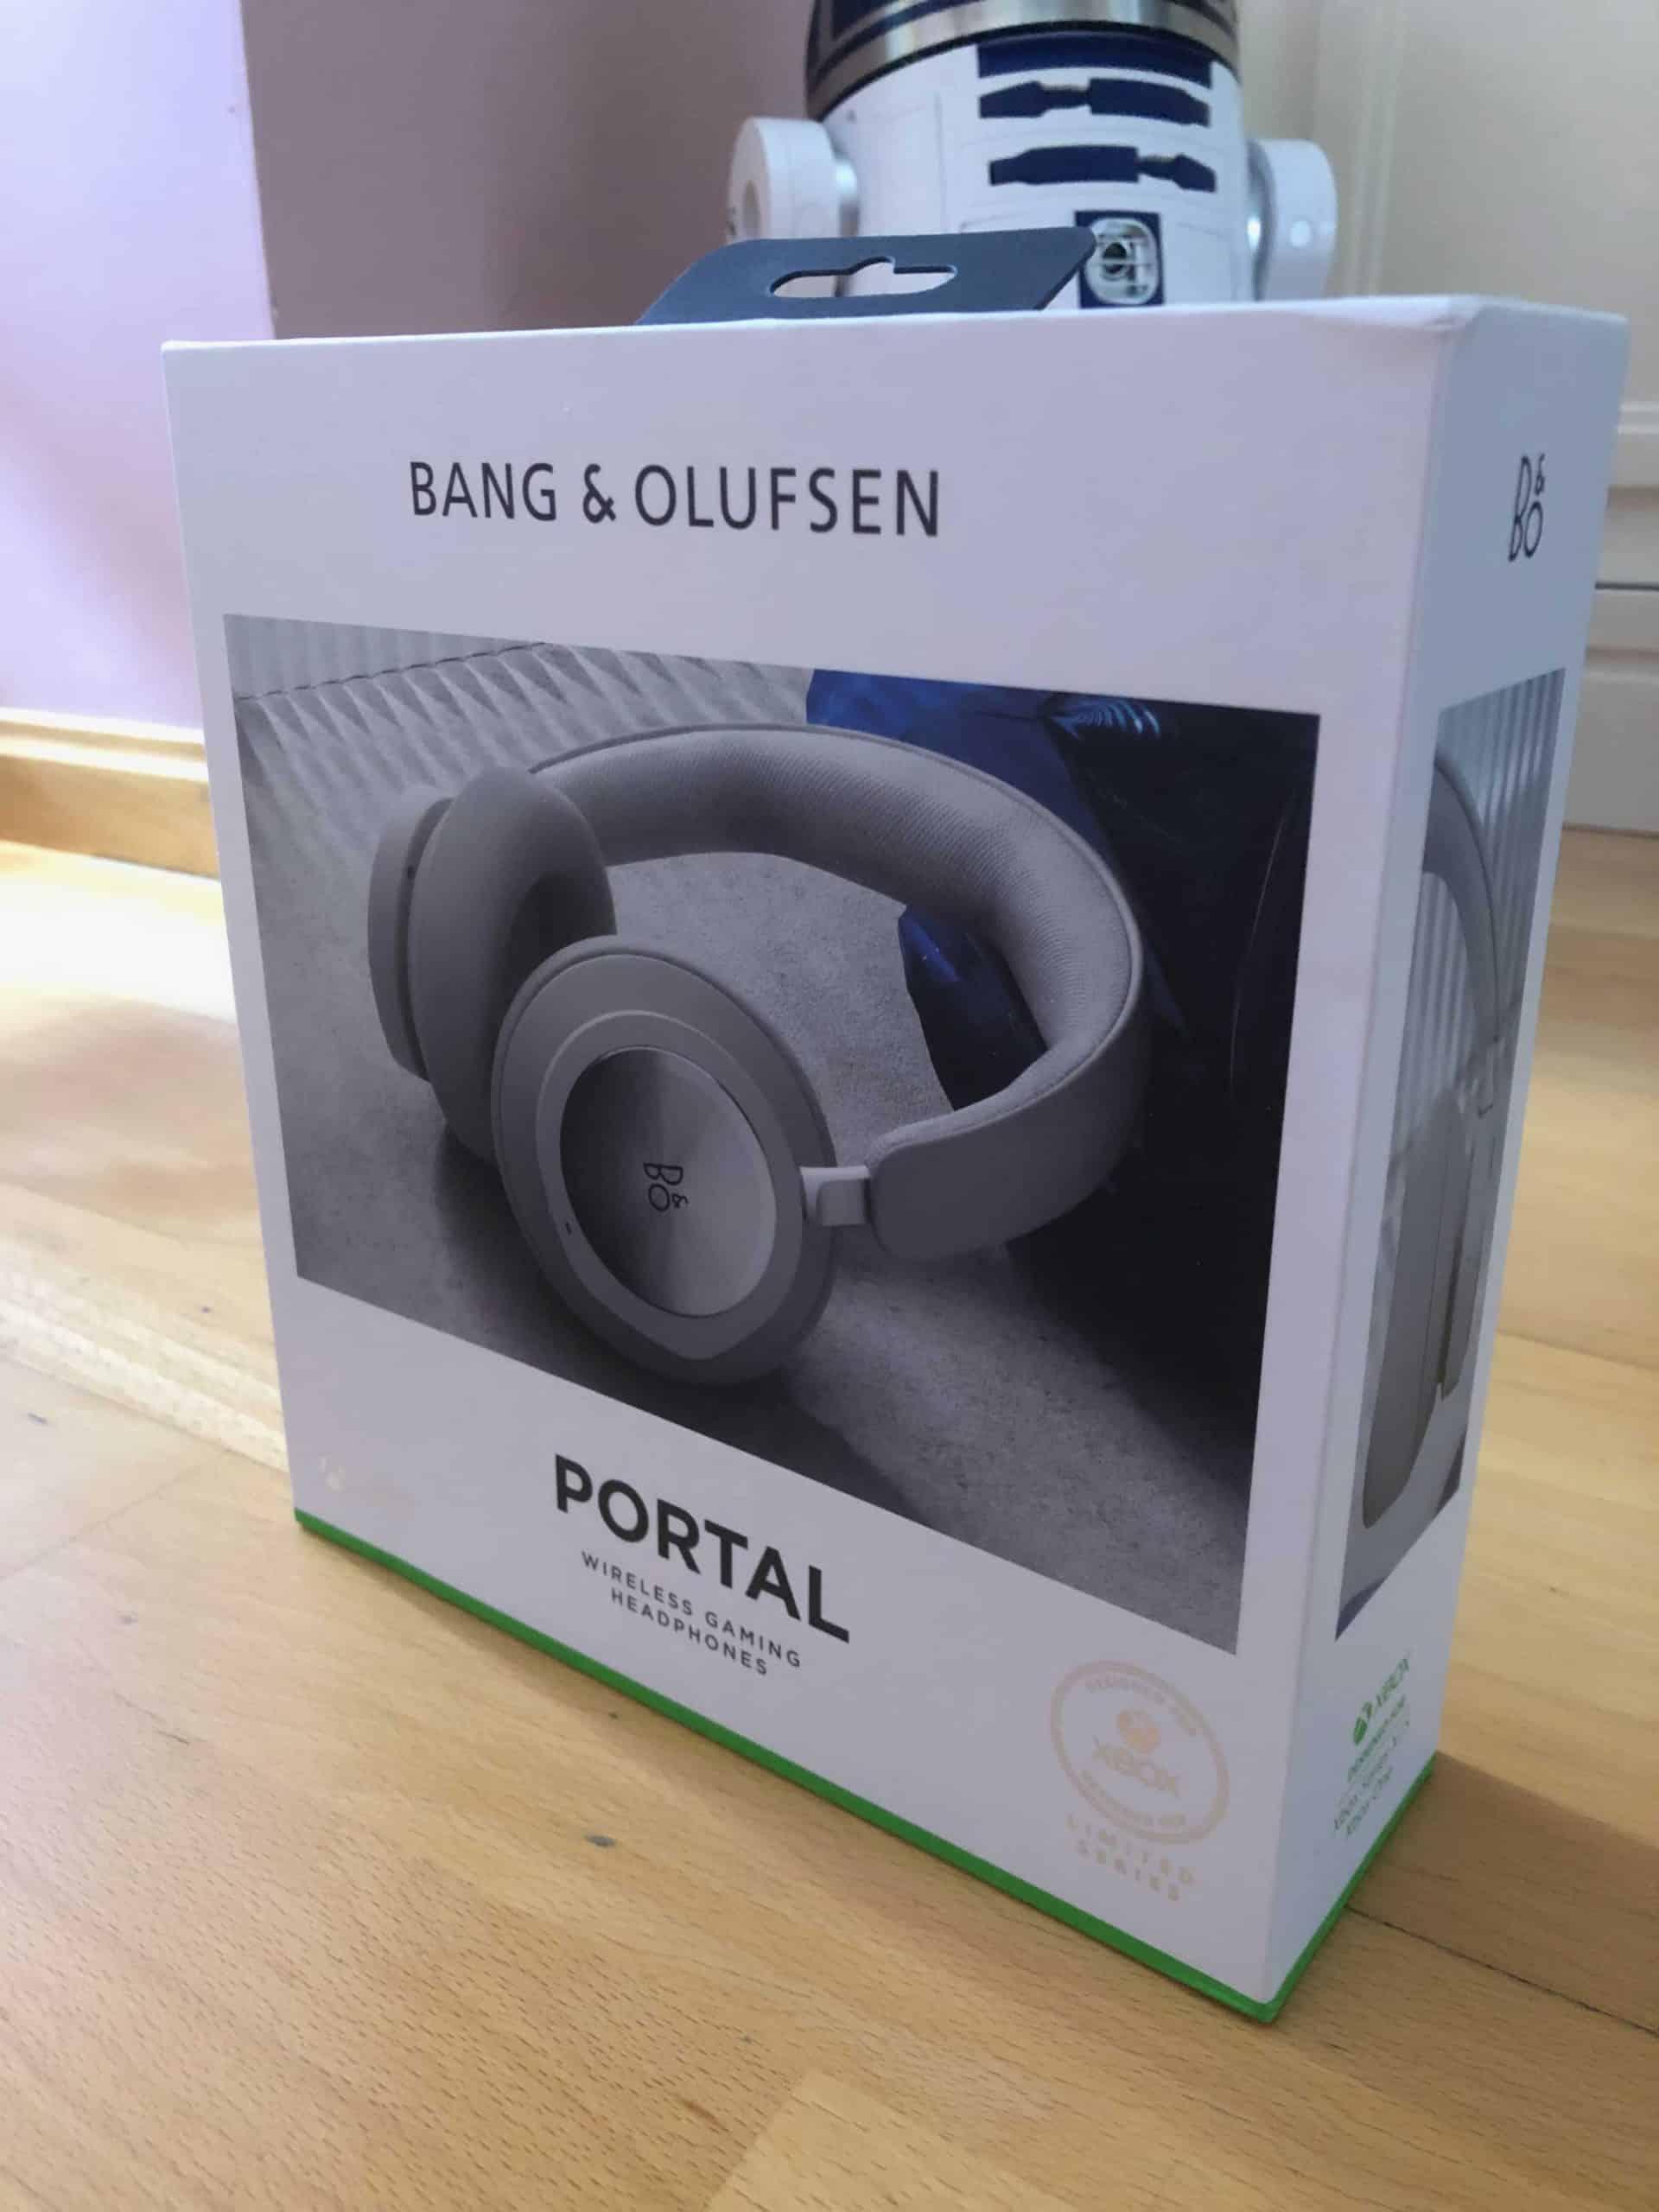 Análisis de Bang & Olufsen Beoplay Portal para Xbox 13